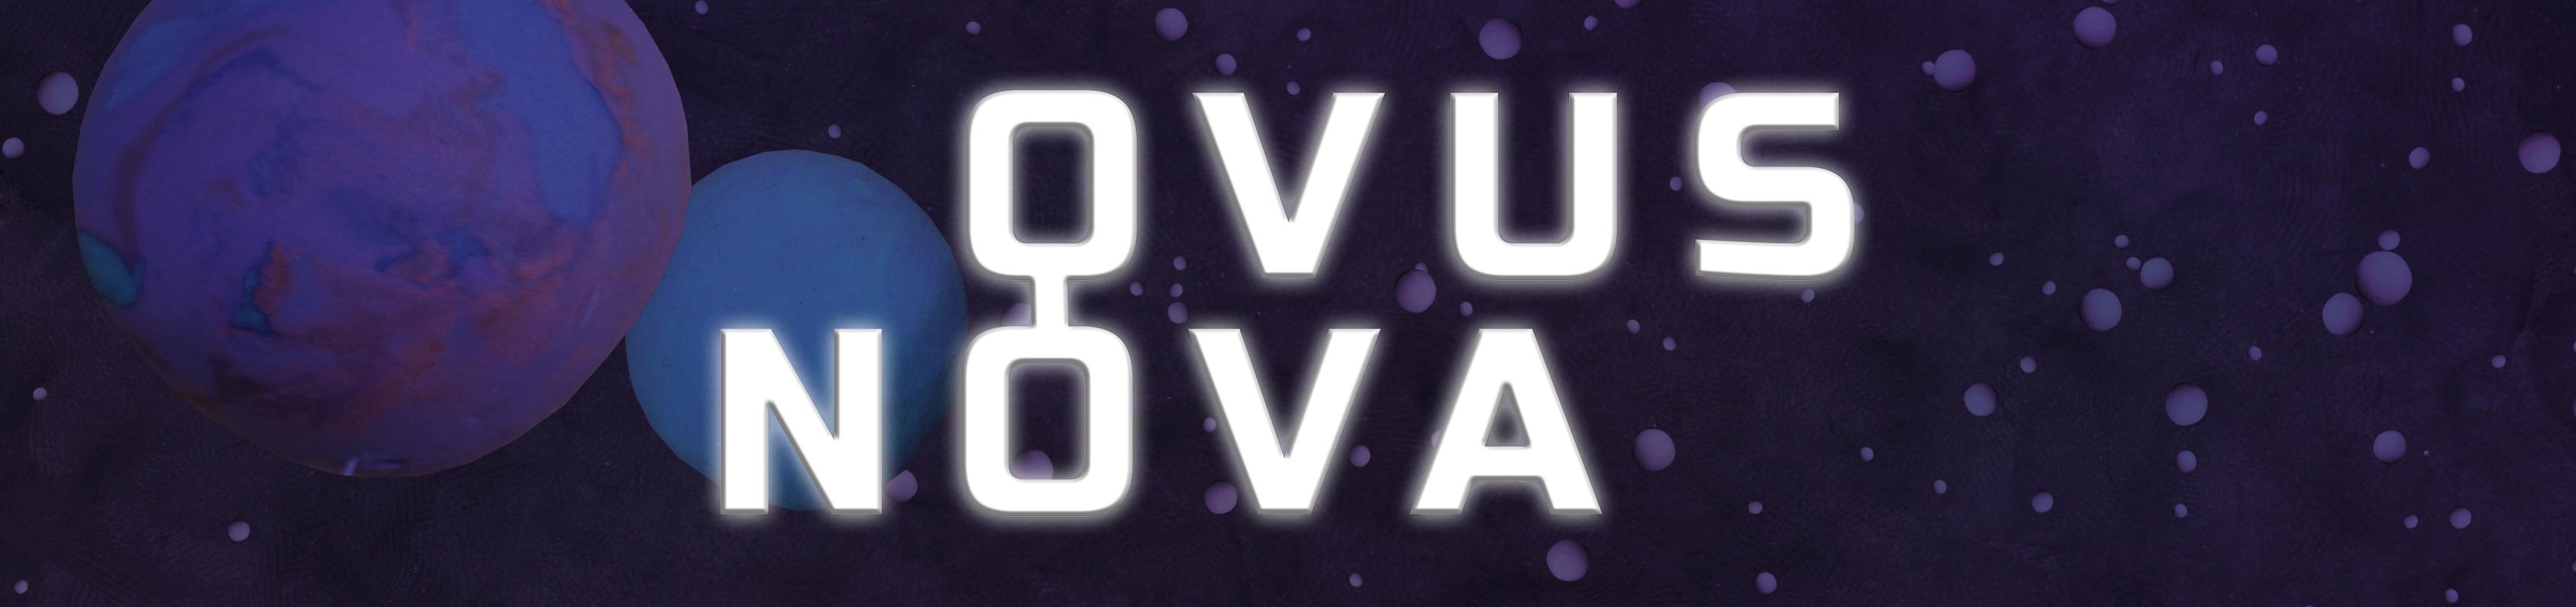 Ovus Nova